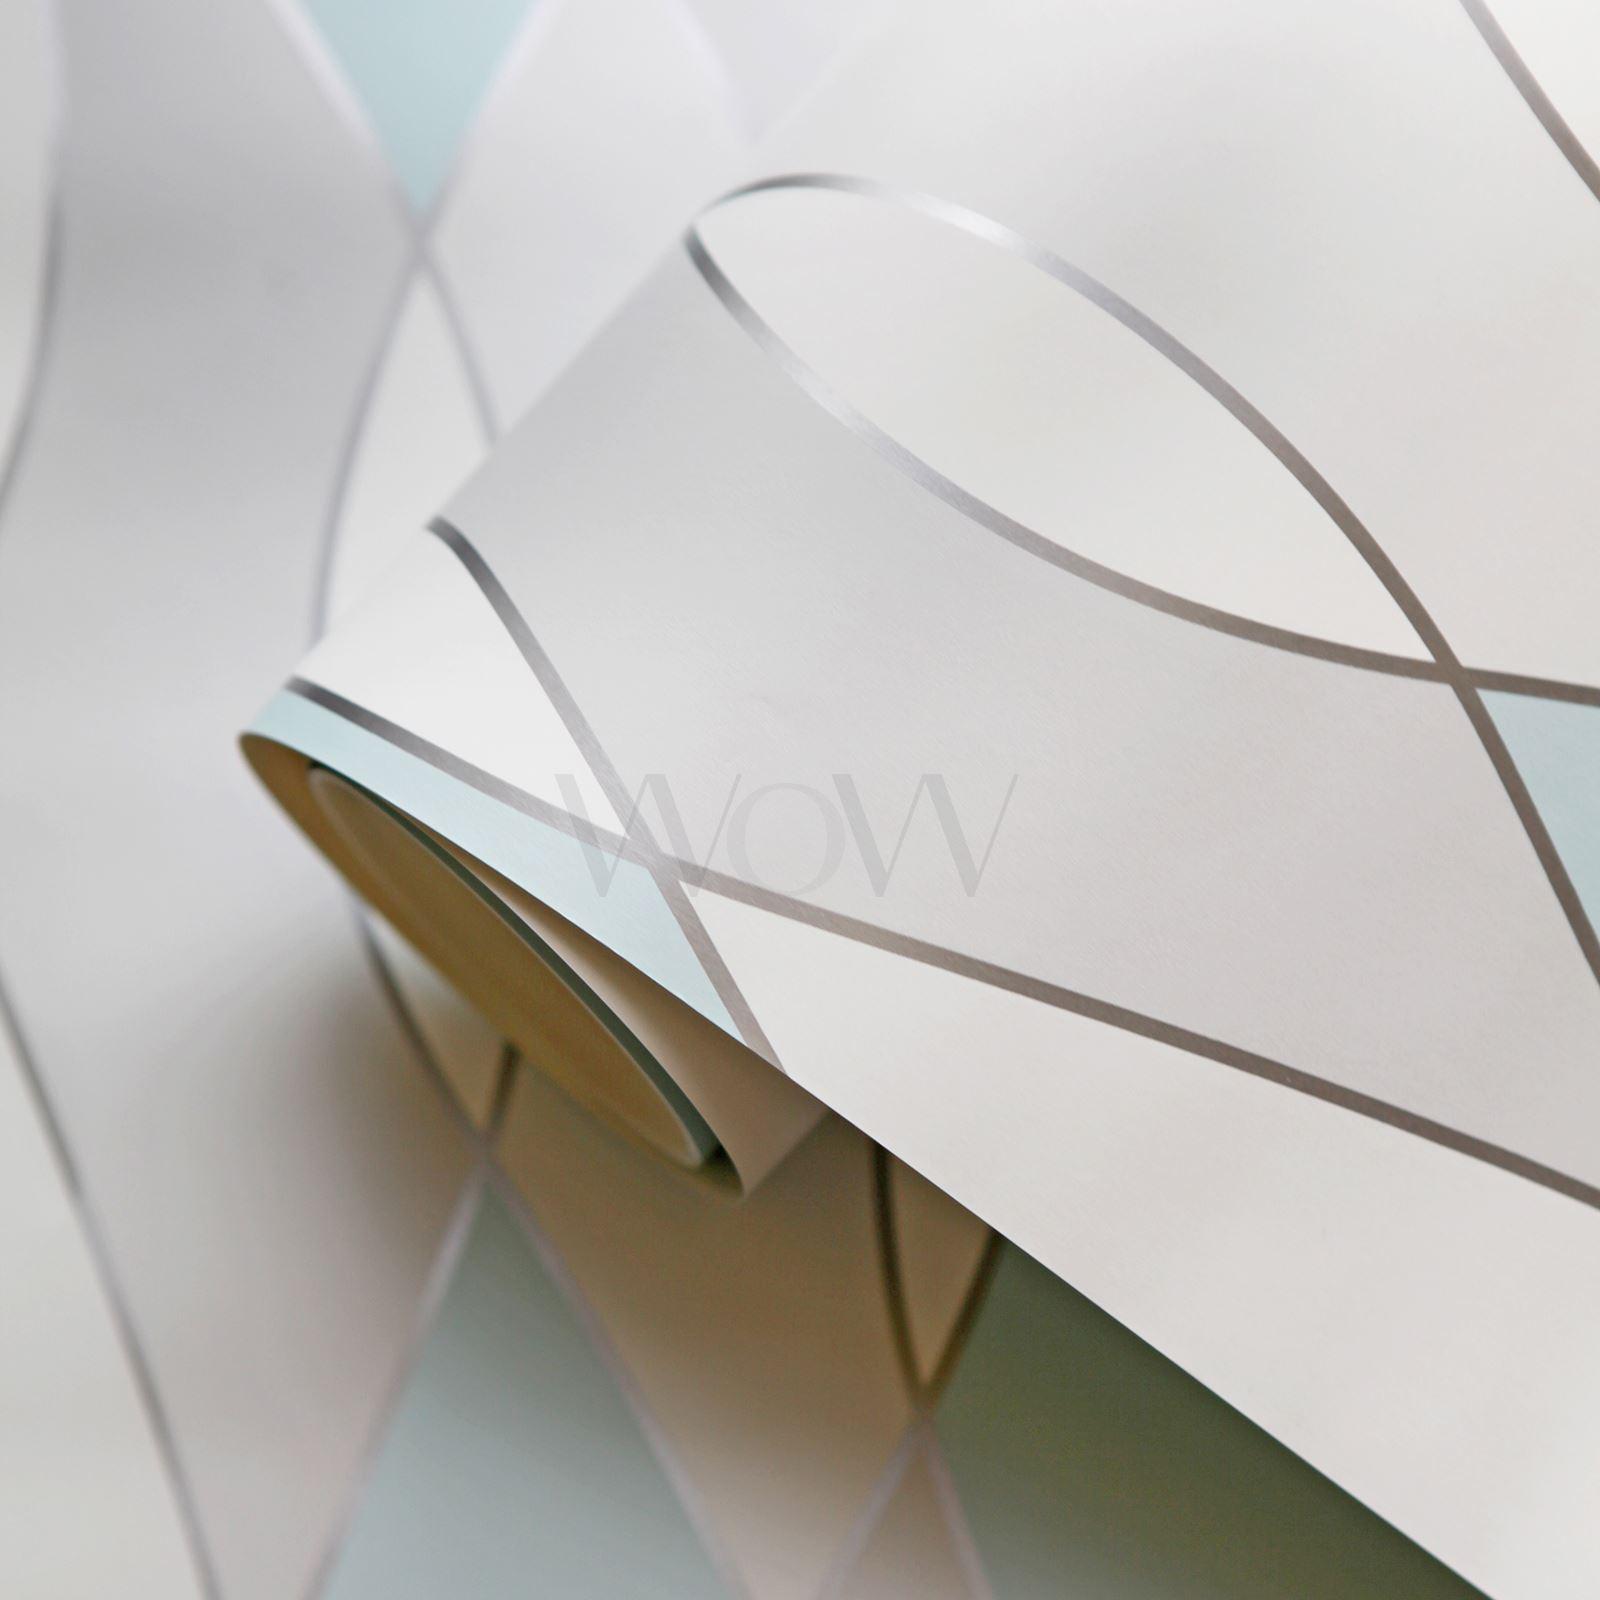 Apex Trellis Sidewall Wallpaper Copper: FINE DECOR APEX GEOMETRIC METALLIC WALLPAPER - TRIANGLES, TRELLIS, WAVE, WOOD